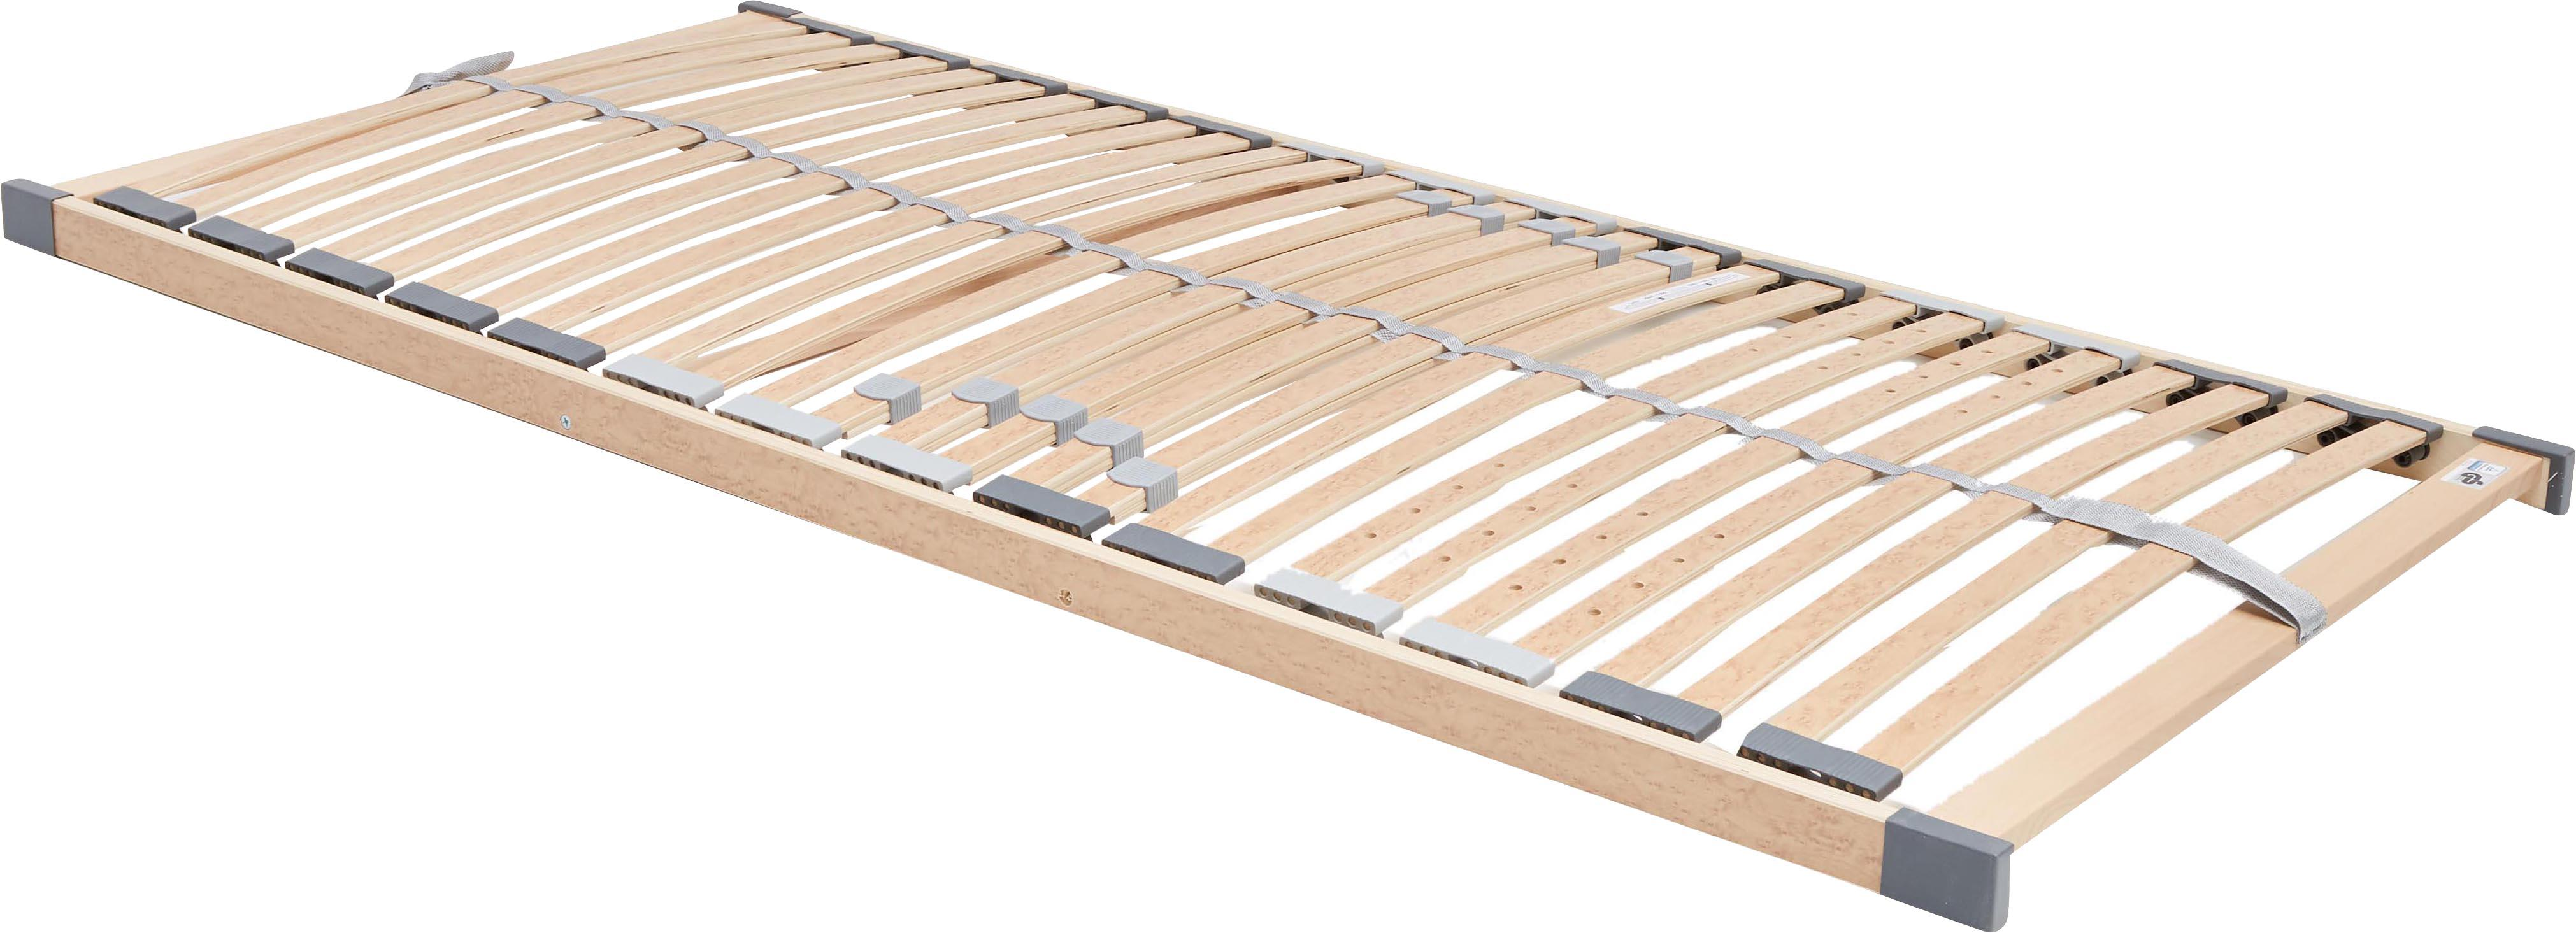 Lattenrost Comfort Plus, Rahmen: Schichtholz, Metall, Leisten: Federholzleisten mit Wurz, Mittelgurt: Kunstfaser, Kappen: Kunststoff, Hellbraun, 90 x 200 cm